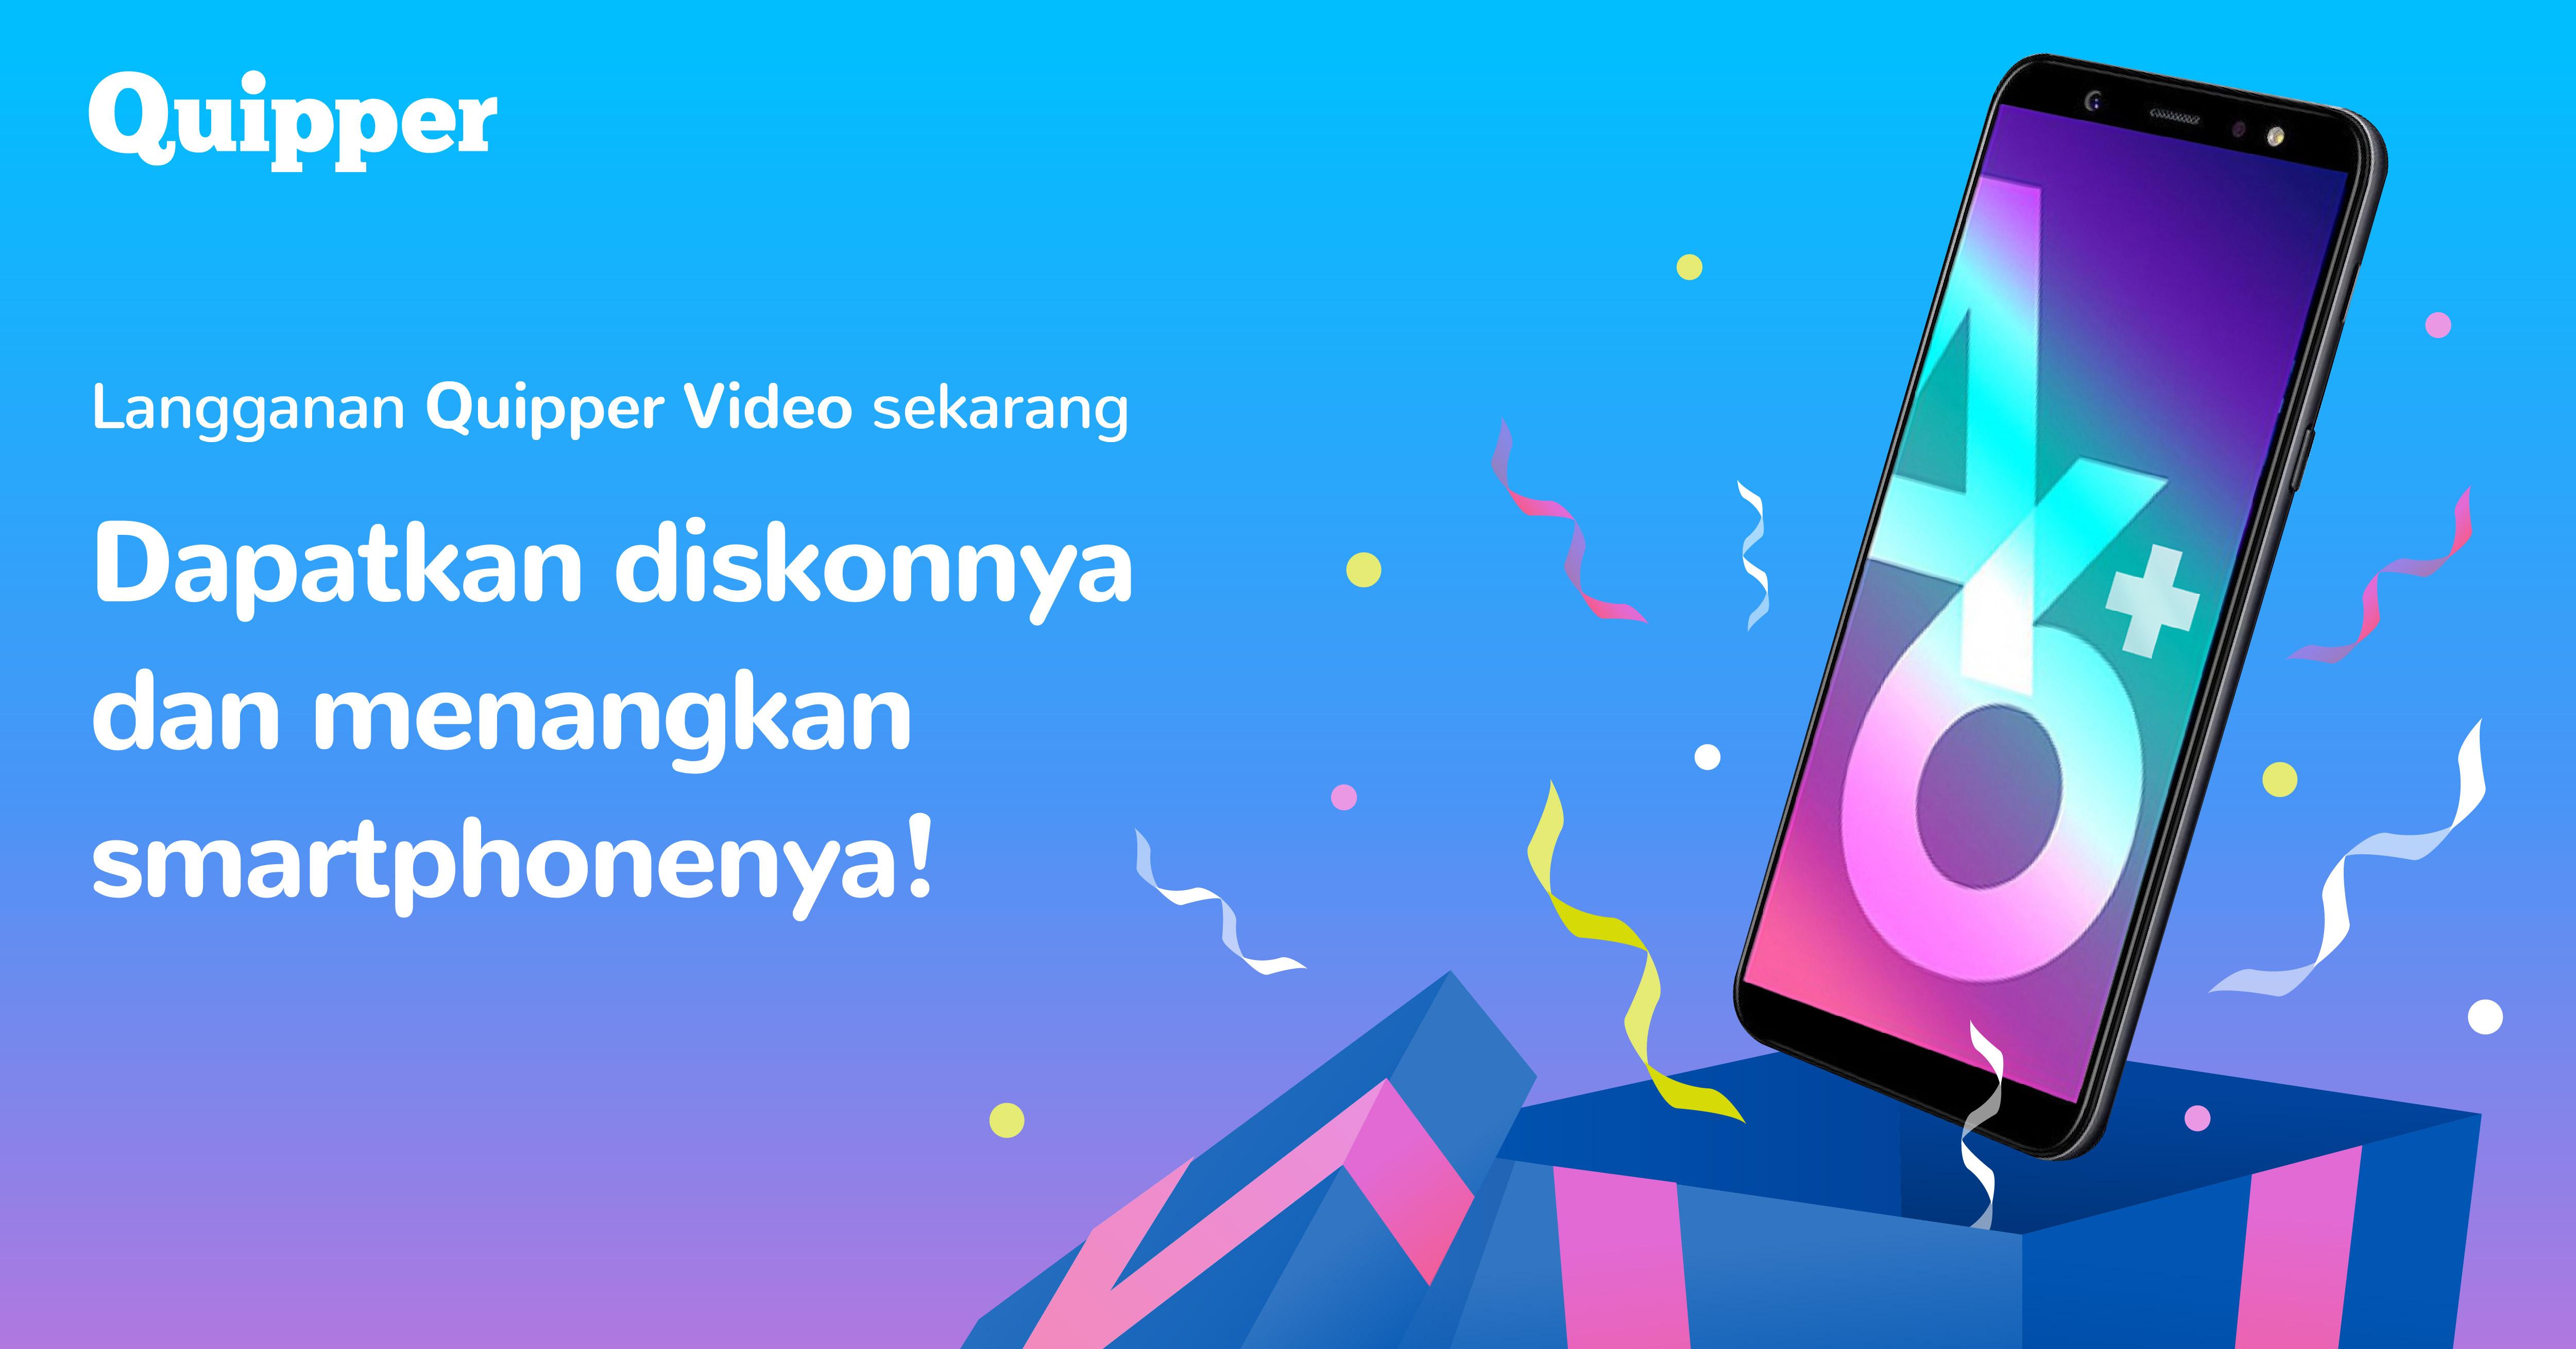 Promo Baru! Dapatkan Diskon Quipper Video & Menangkan Samsung Galaxy A6+